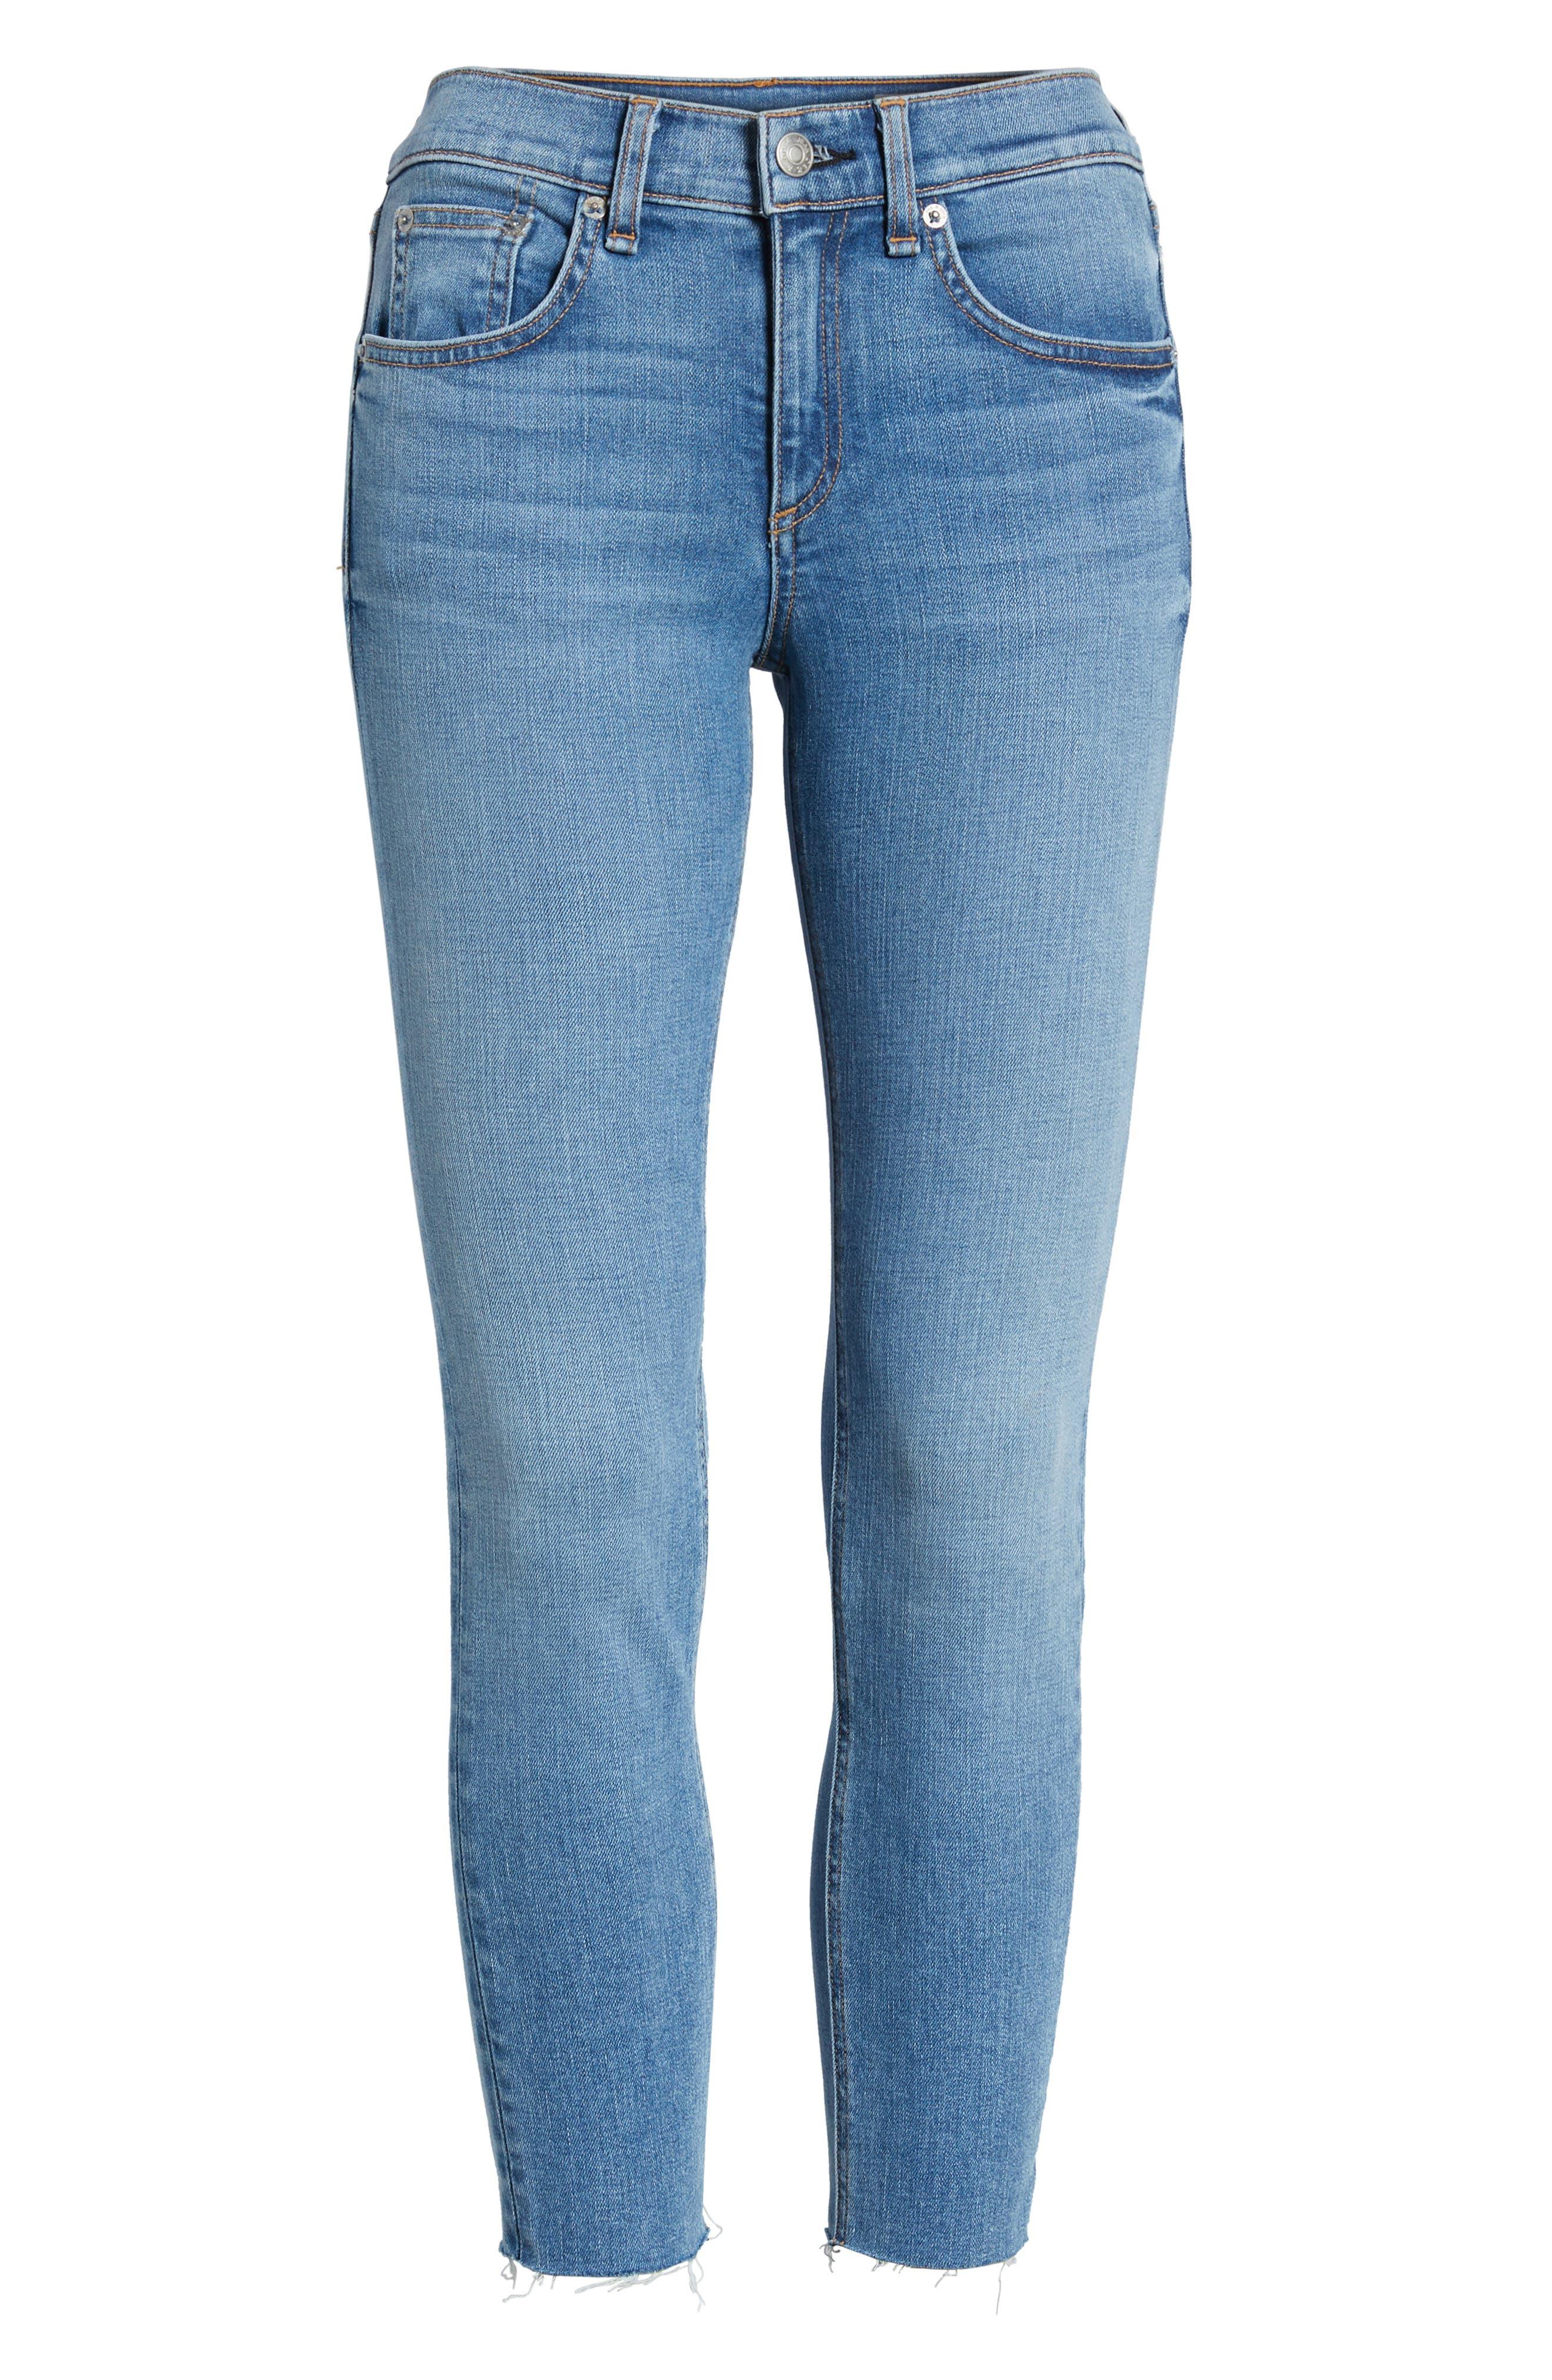 Crop Skinny Jeans,                             Alternate thumbnail 7, color,                             424